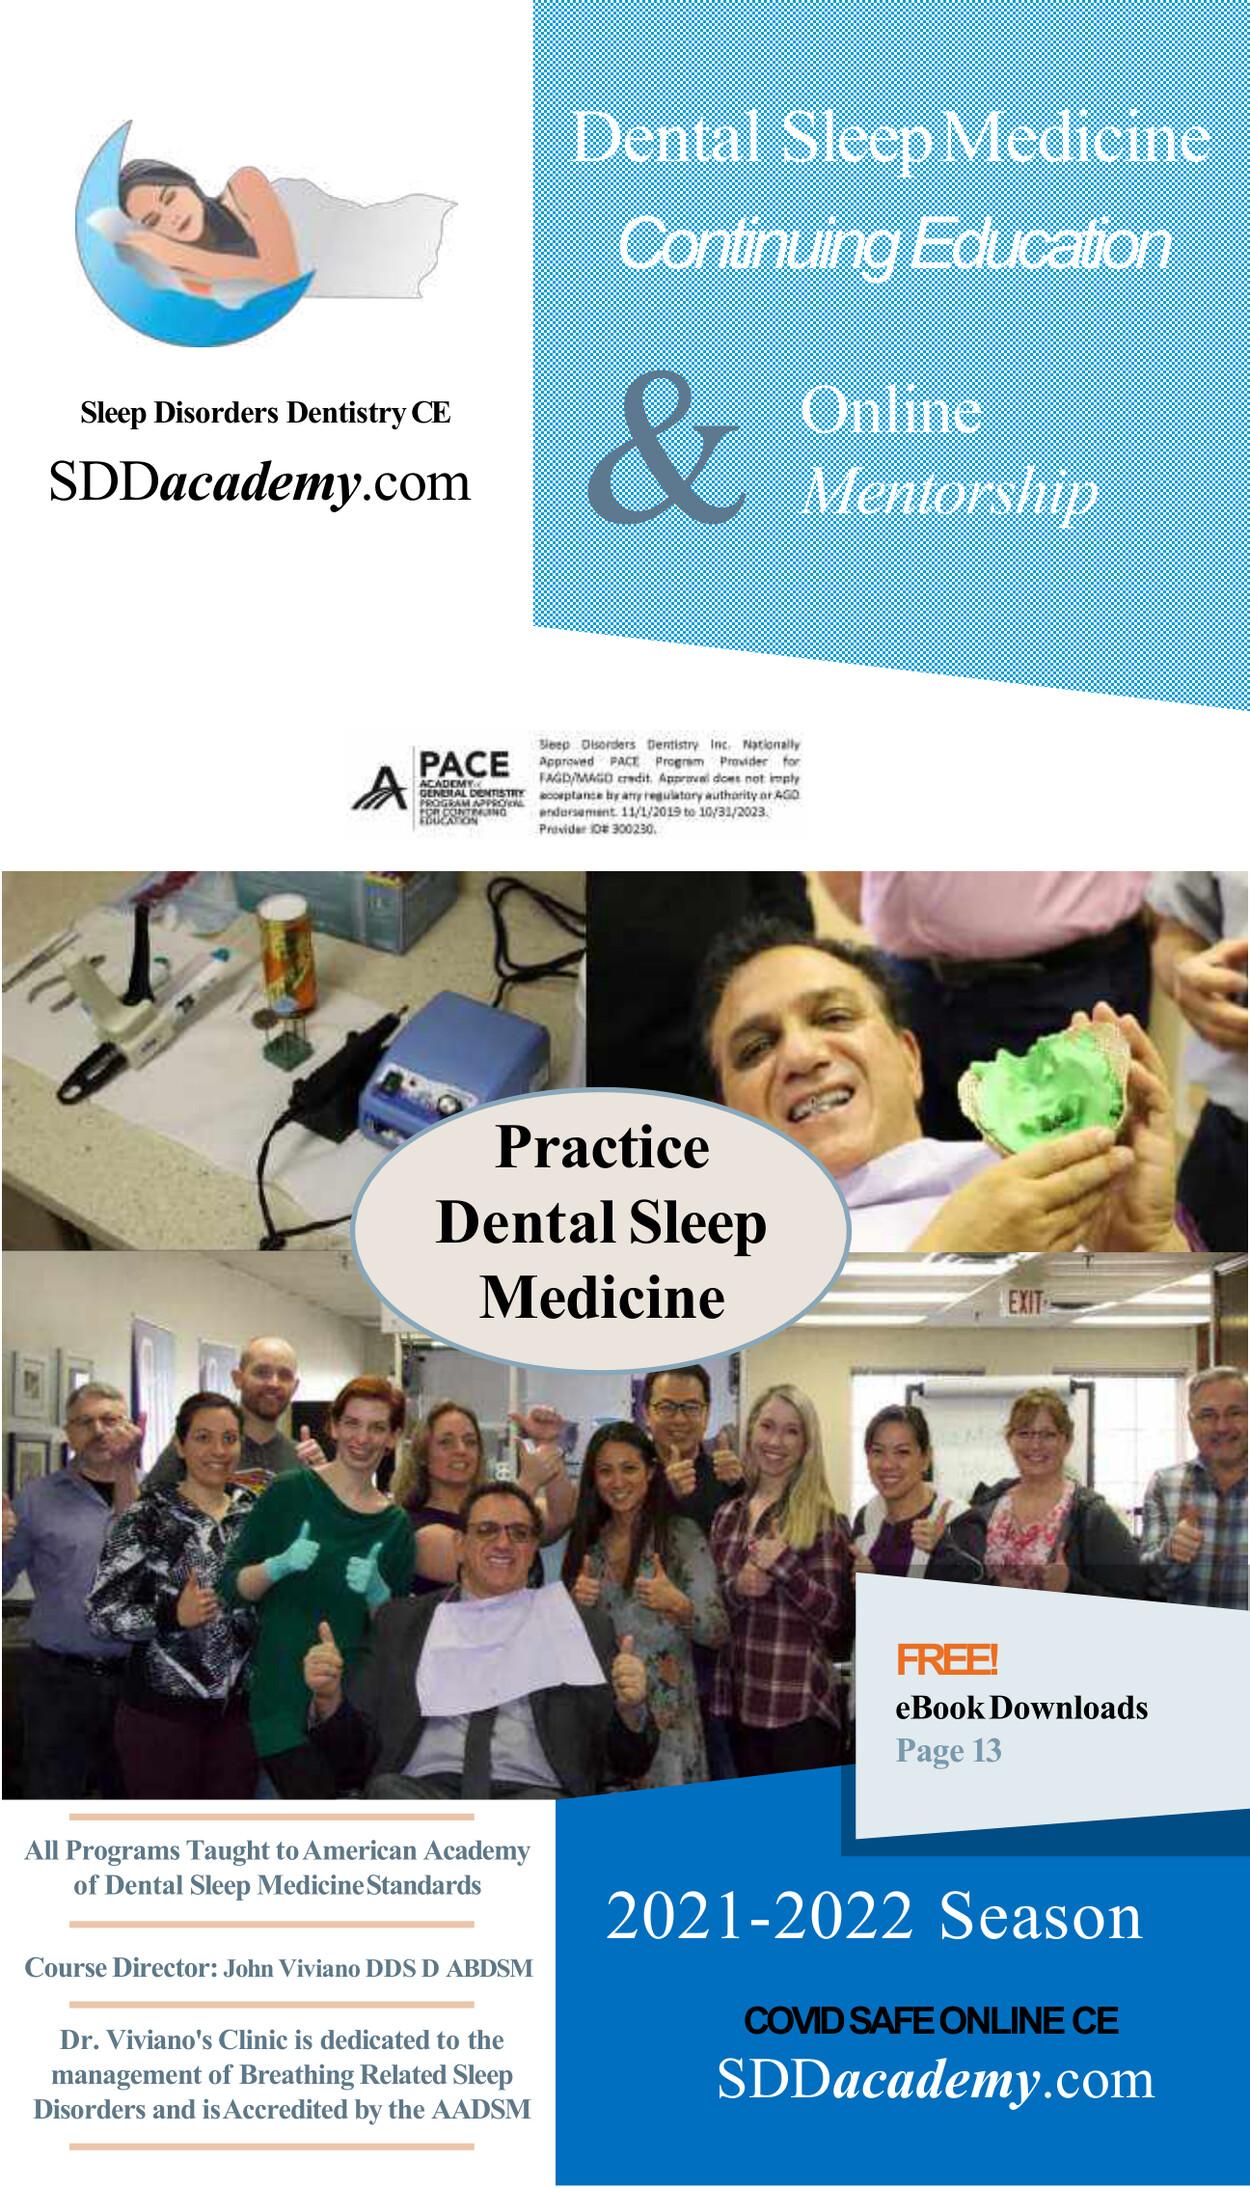 SDDacademy online Syllabus